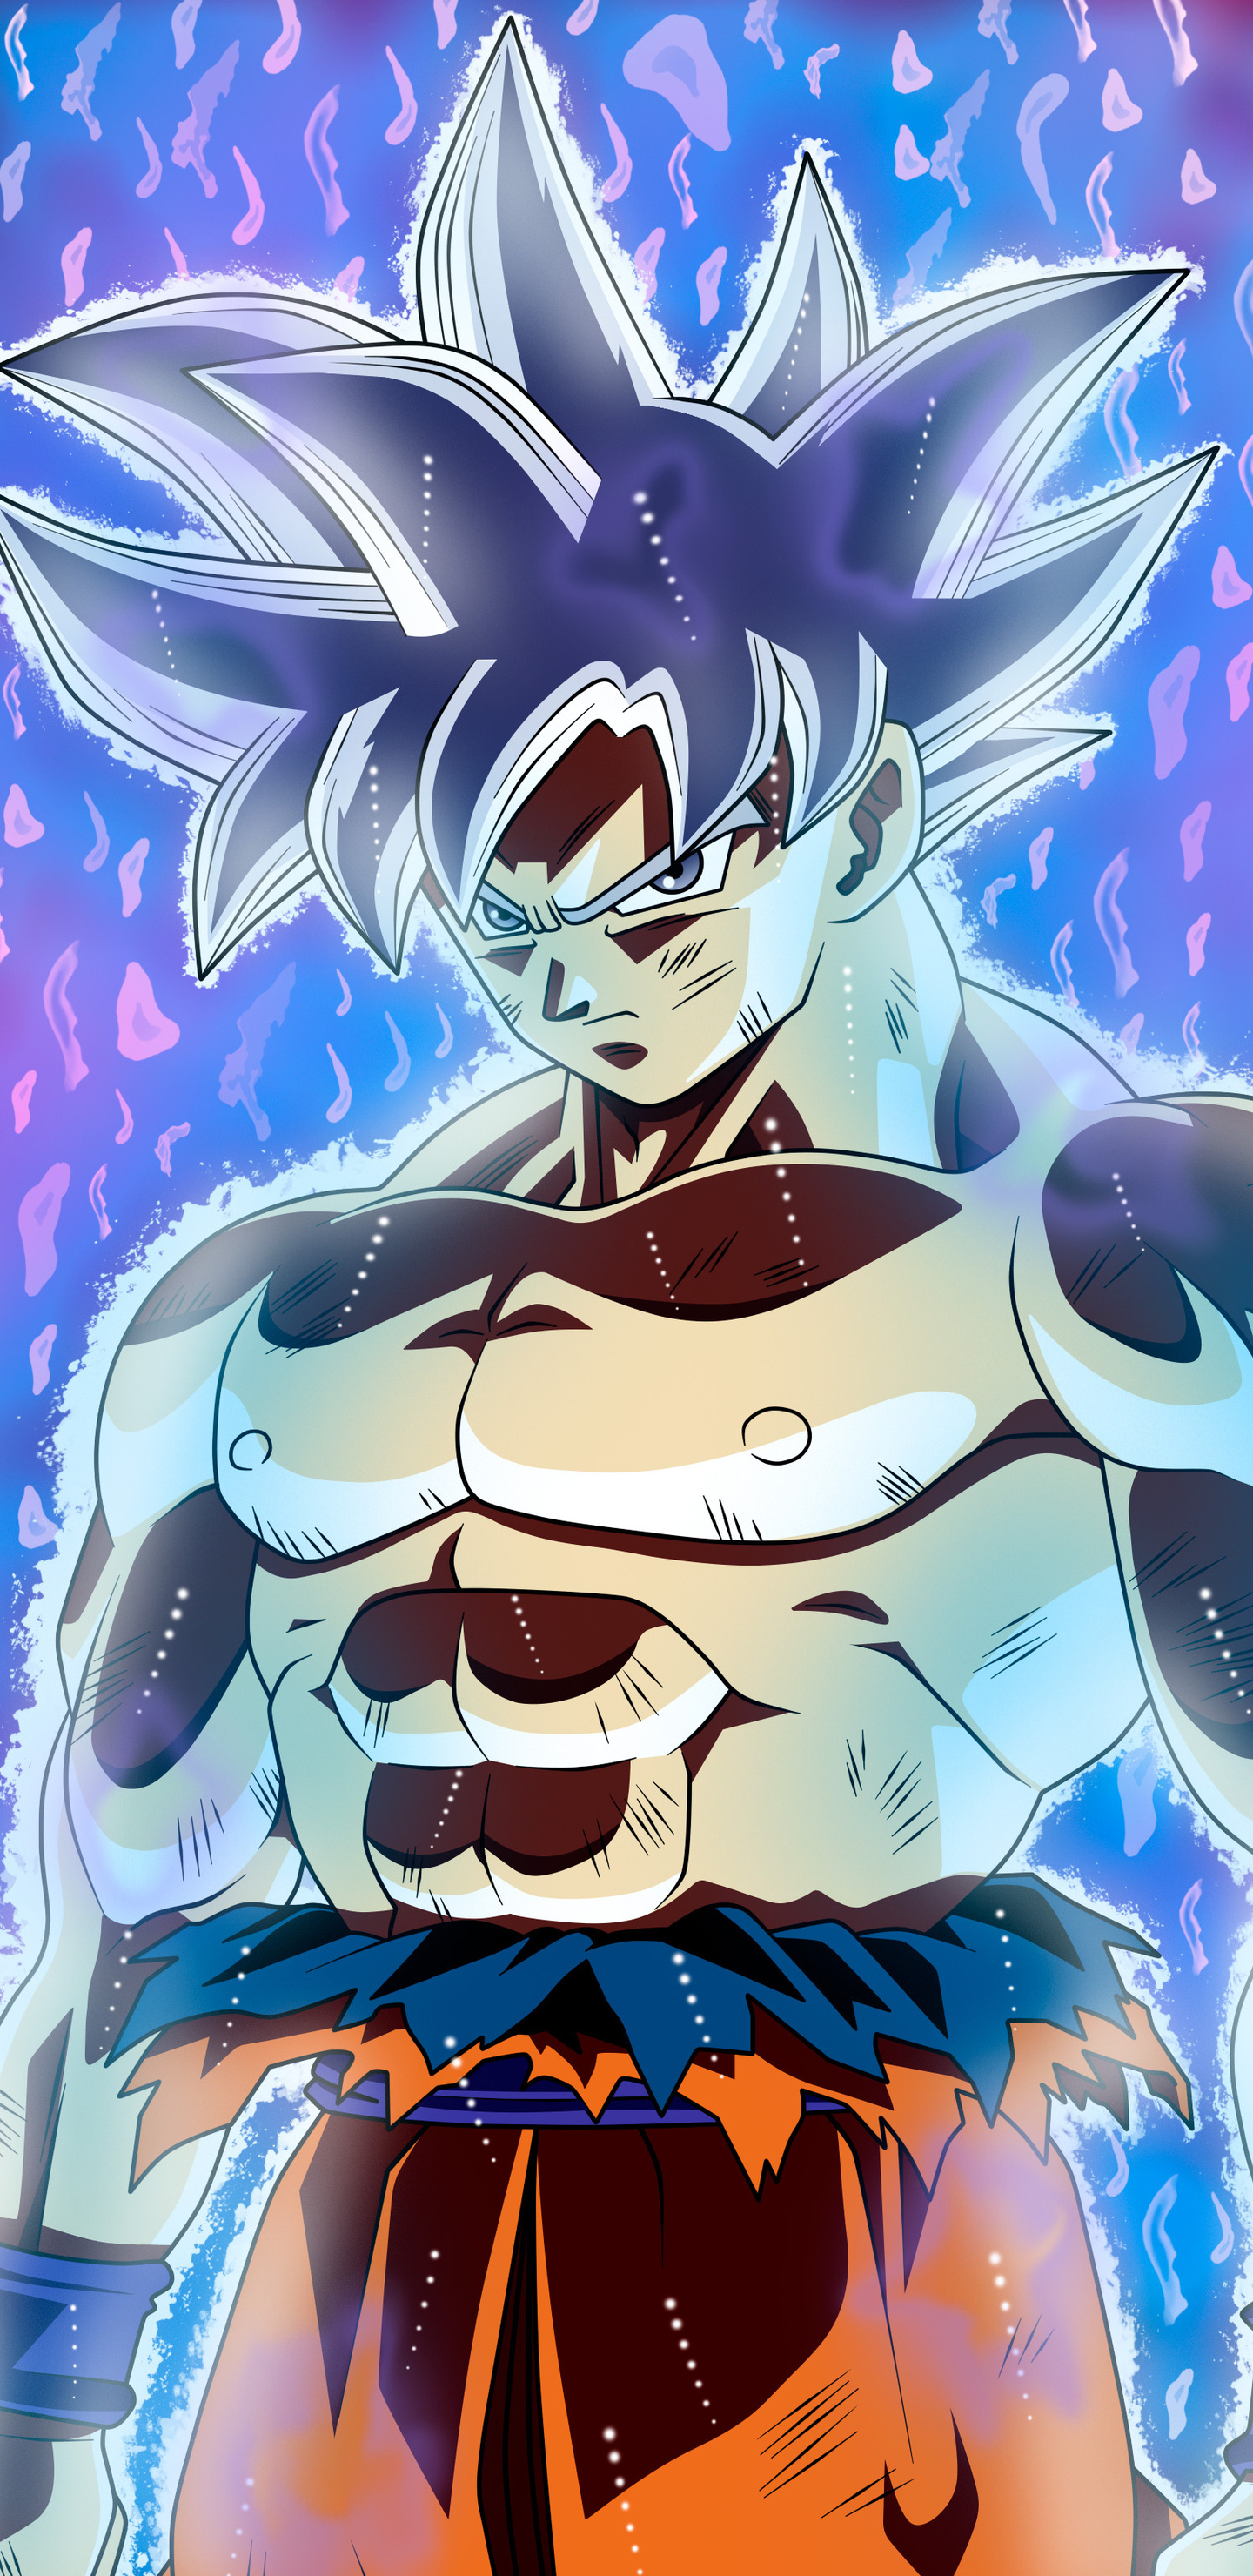 1440x2960 Goku Migatte No Gokui Perfecto Ultra Instinct ...